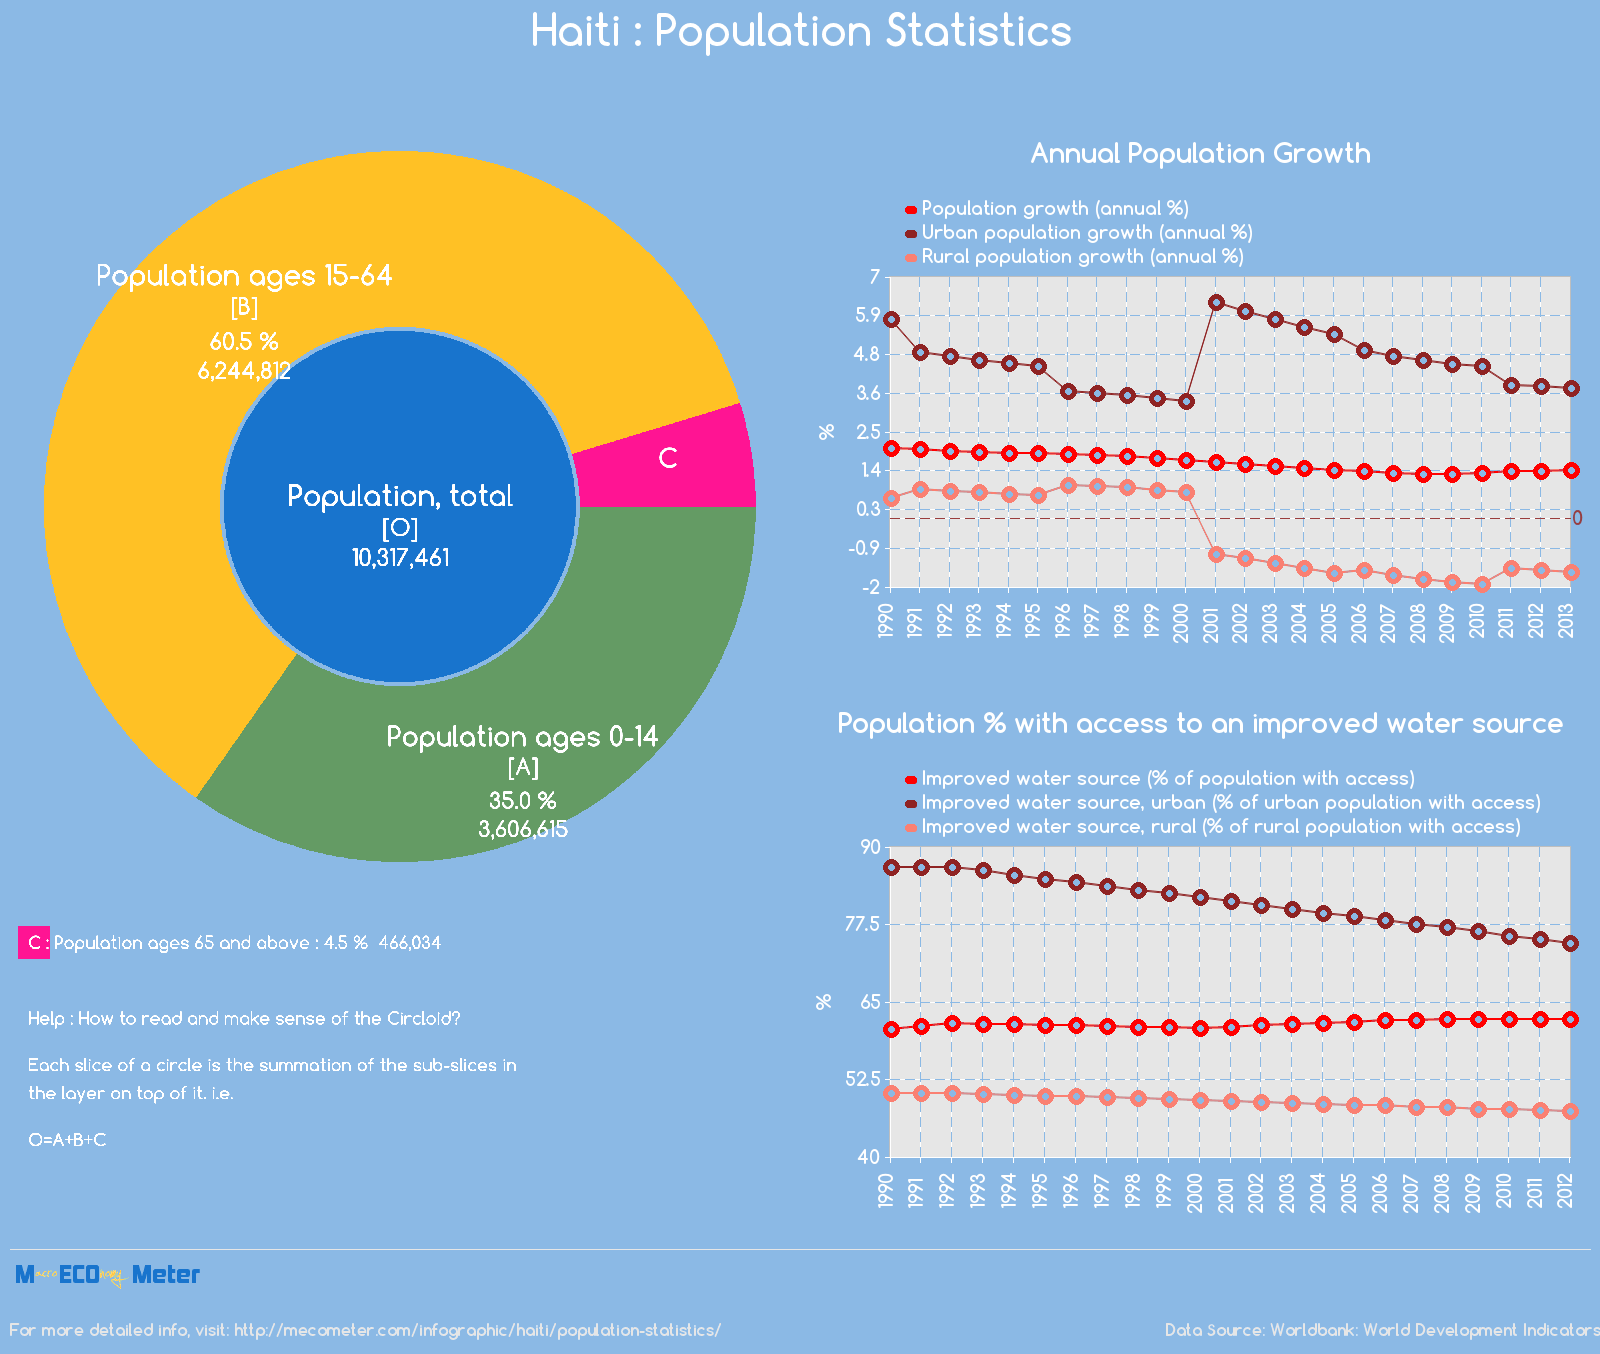 Haiti : Population Statistics